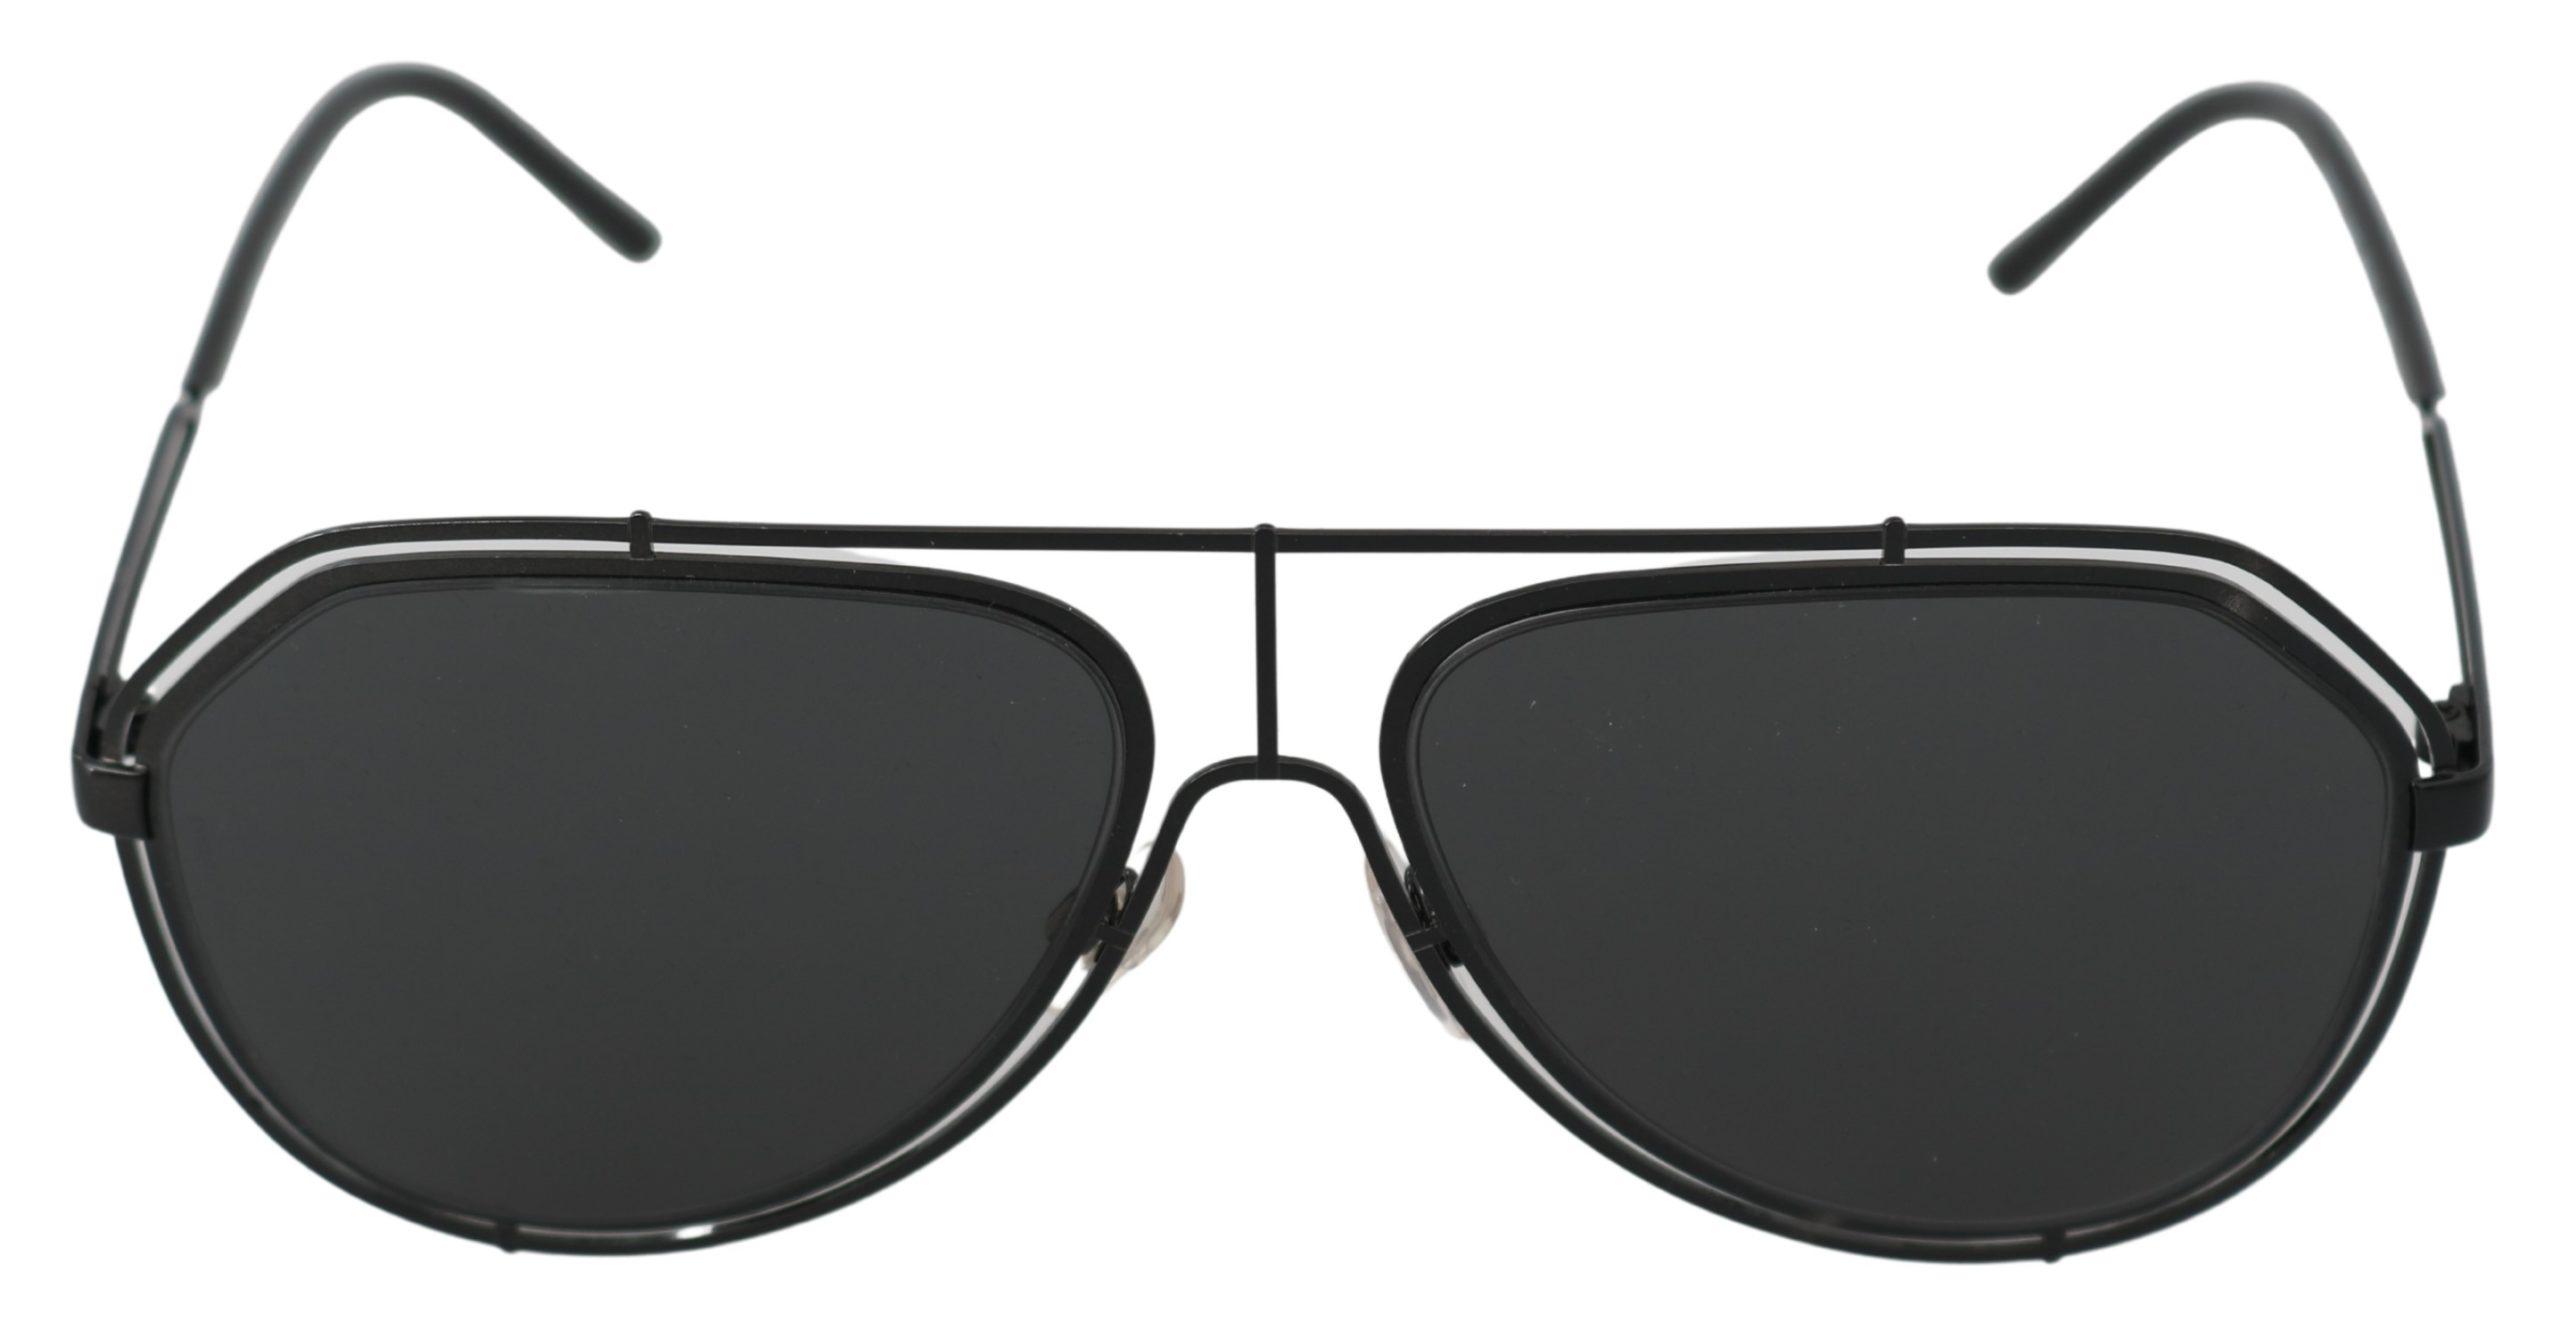 Dolce & Gabbana Women's Pilot Aviator Sunglasses Black GLA766